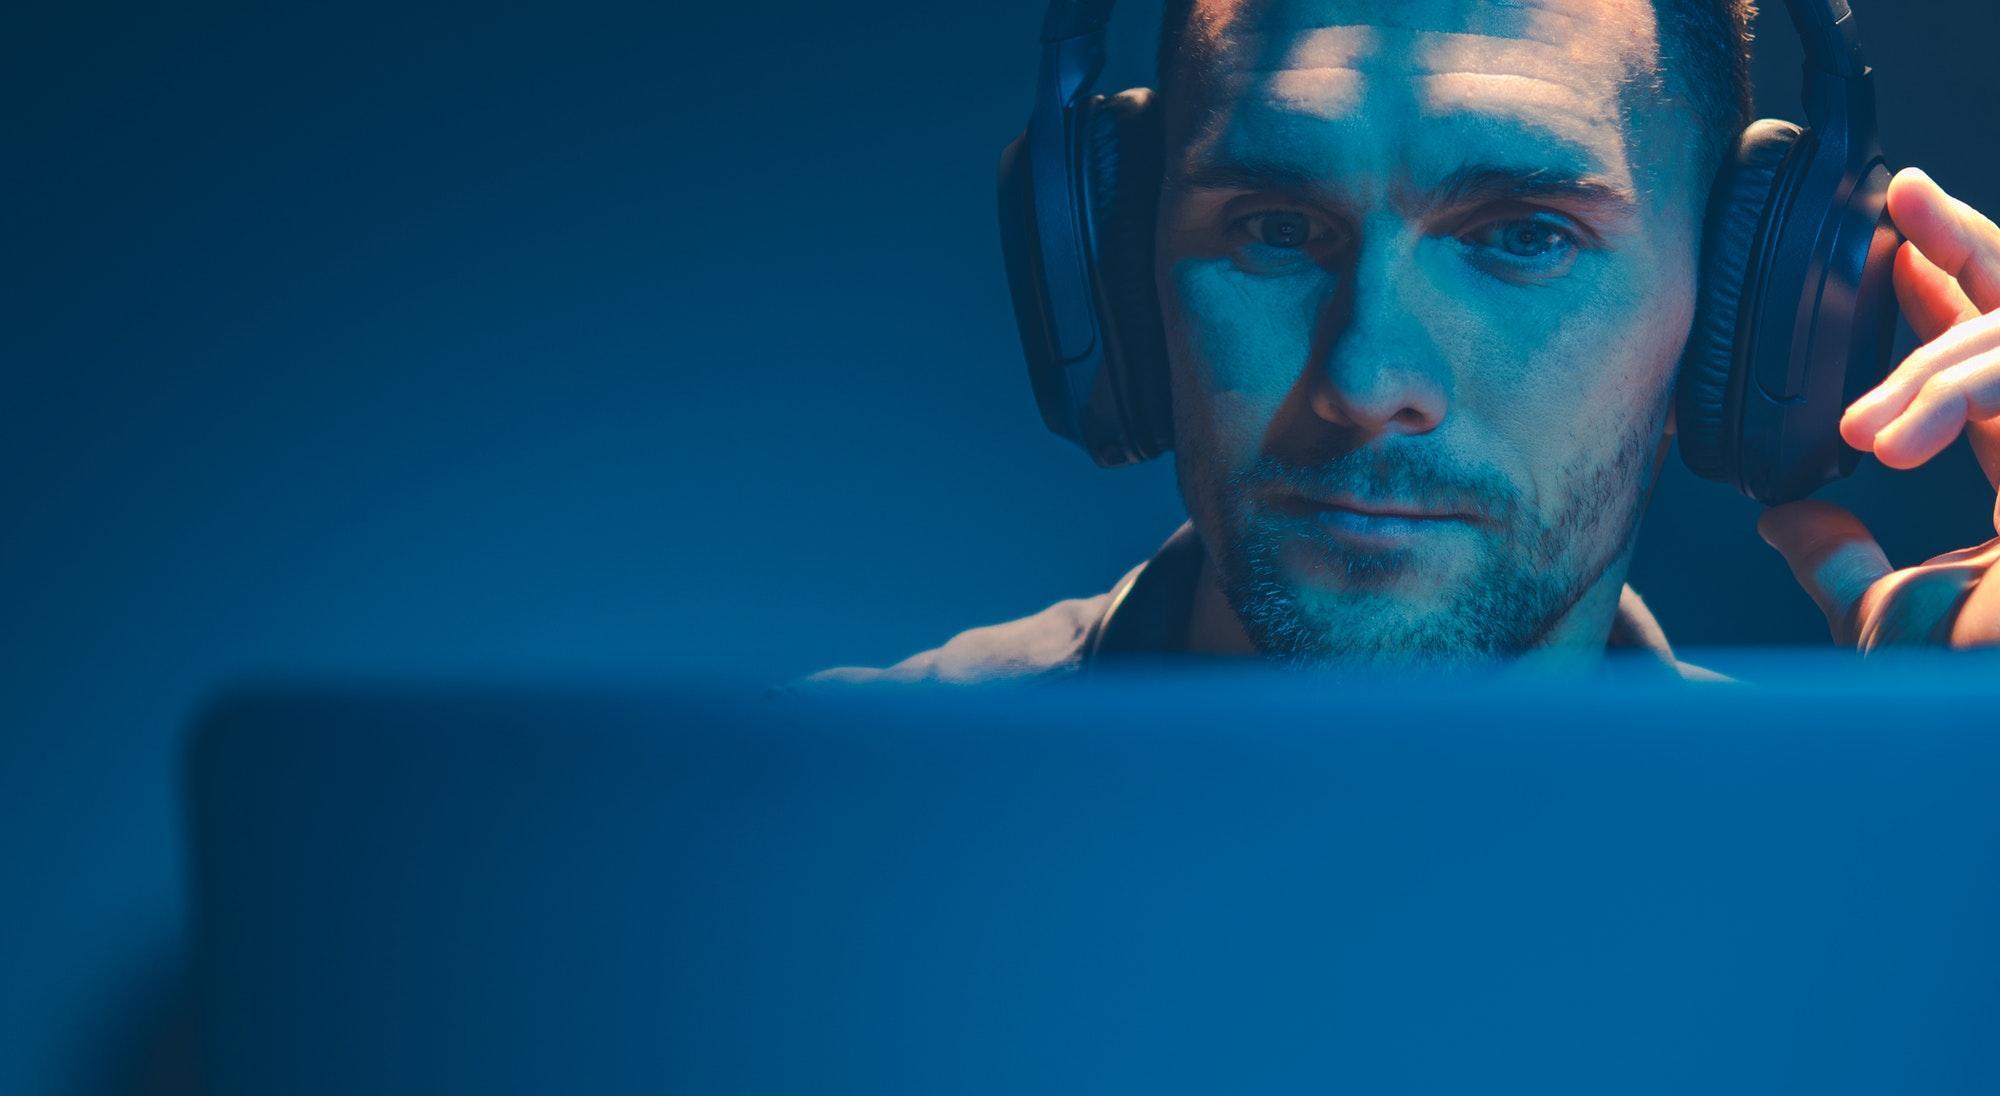 Men Listening Podcast on His Wireless Headphones